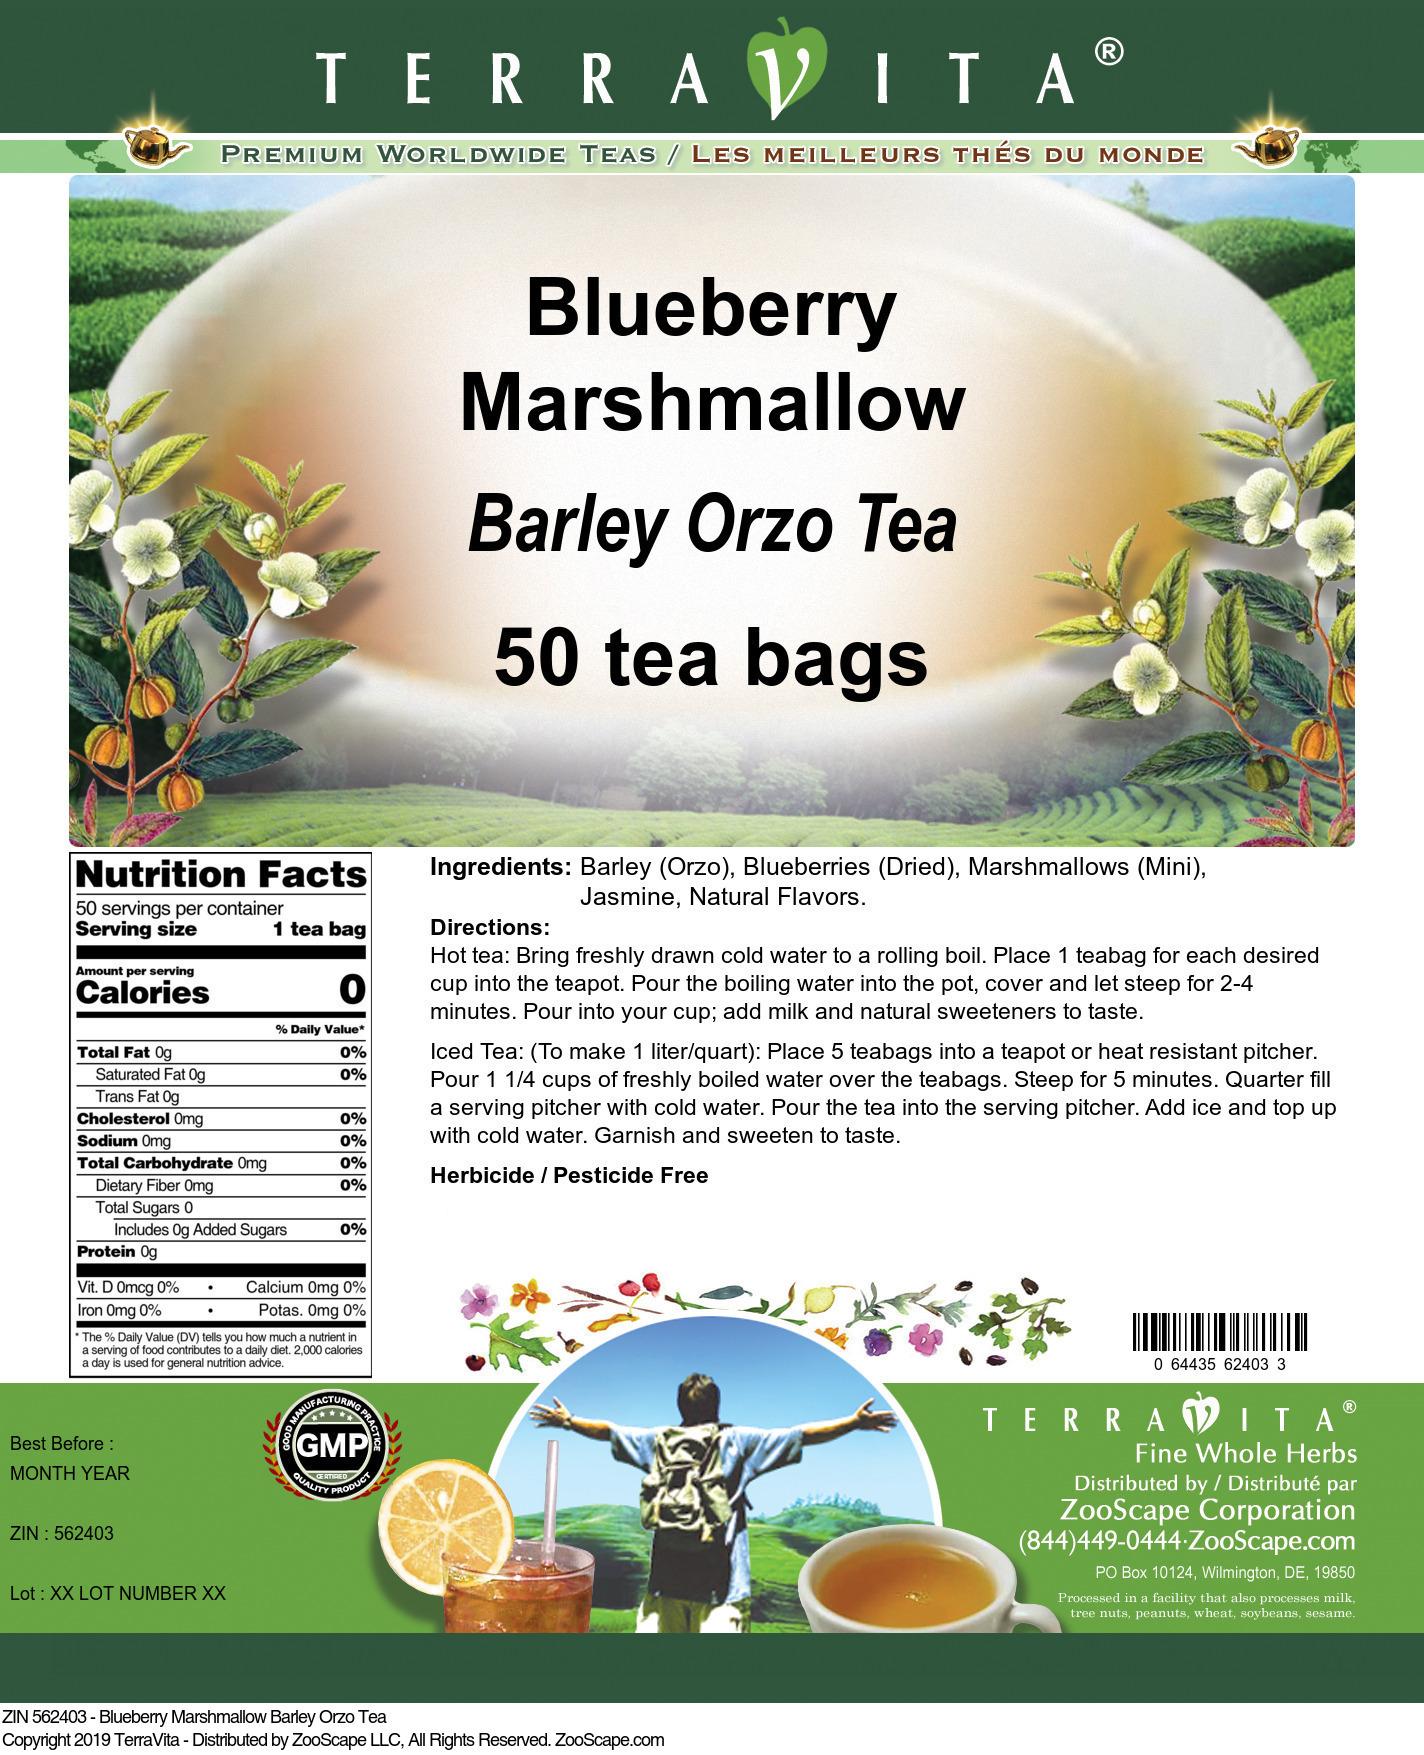 Blueberry Marshmallow Barley Orzo Tea